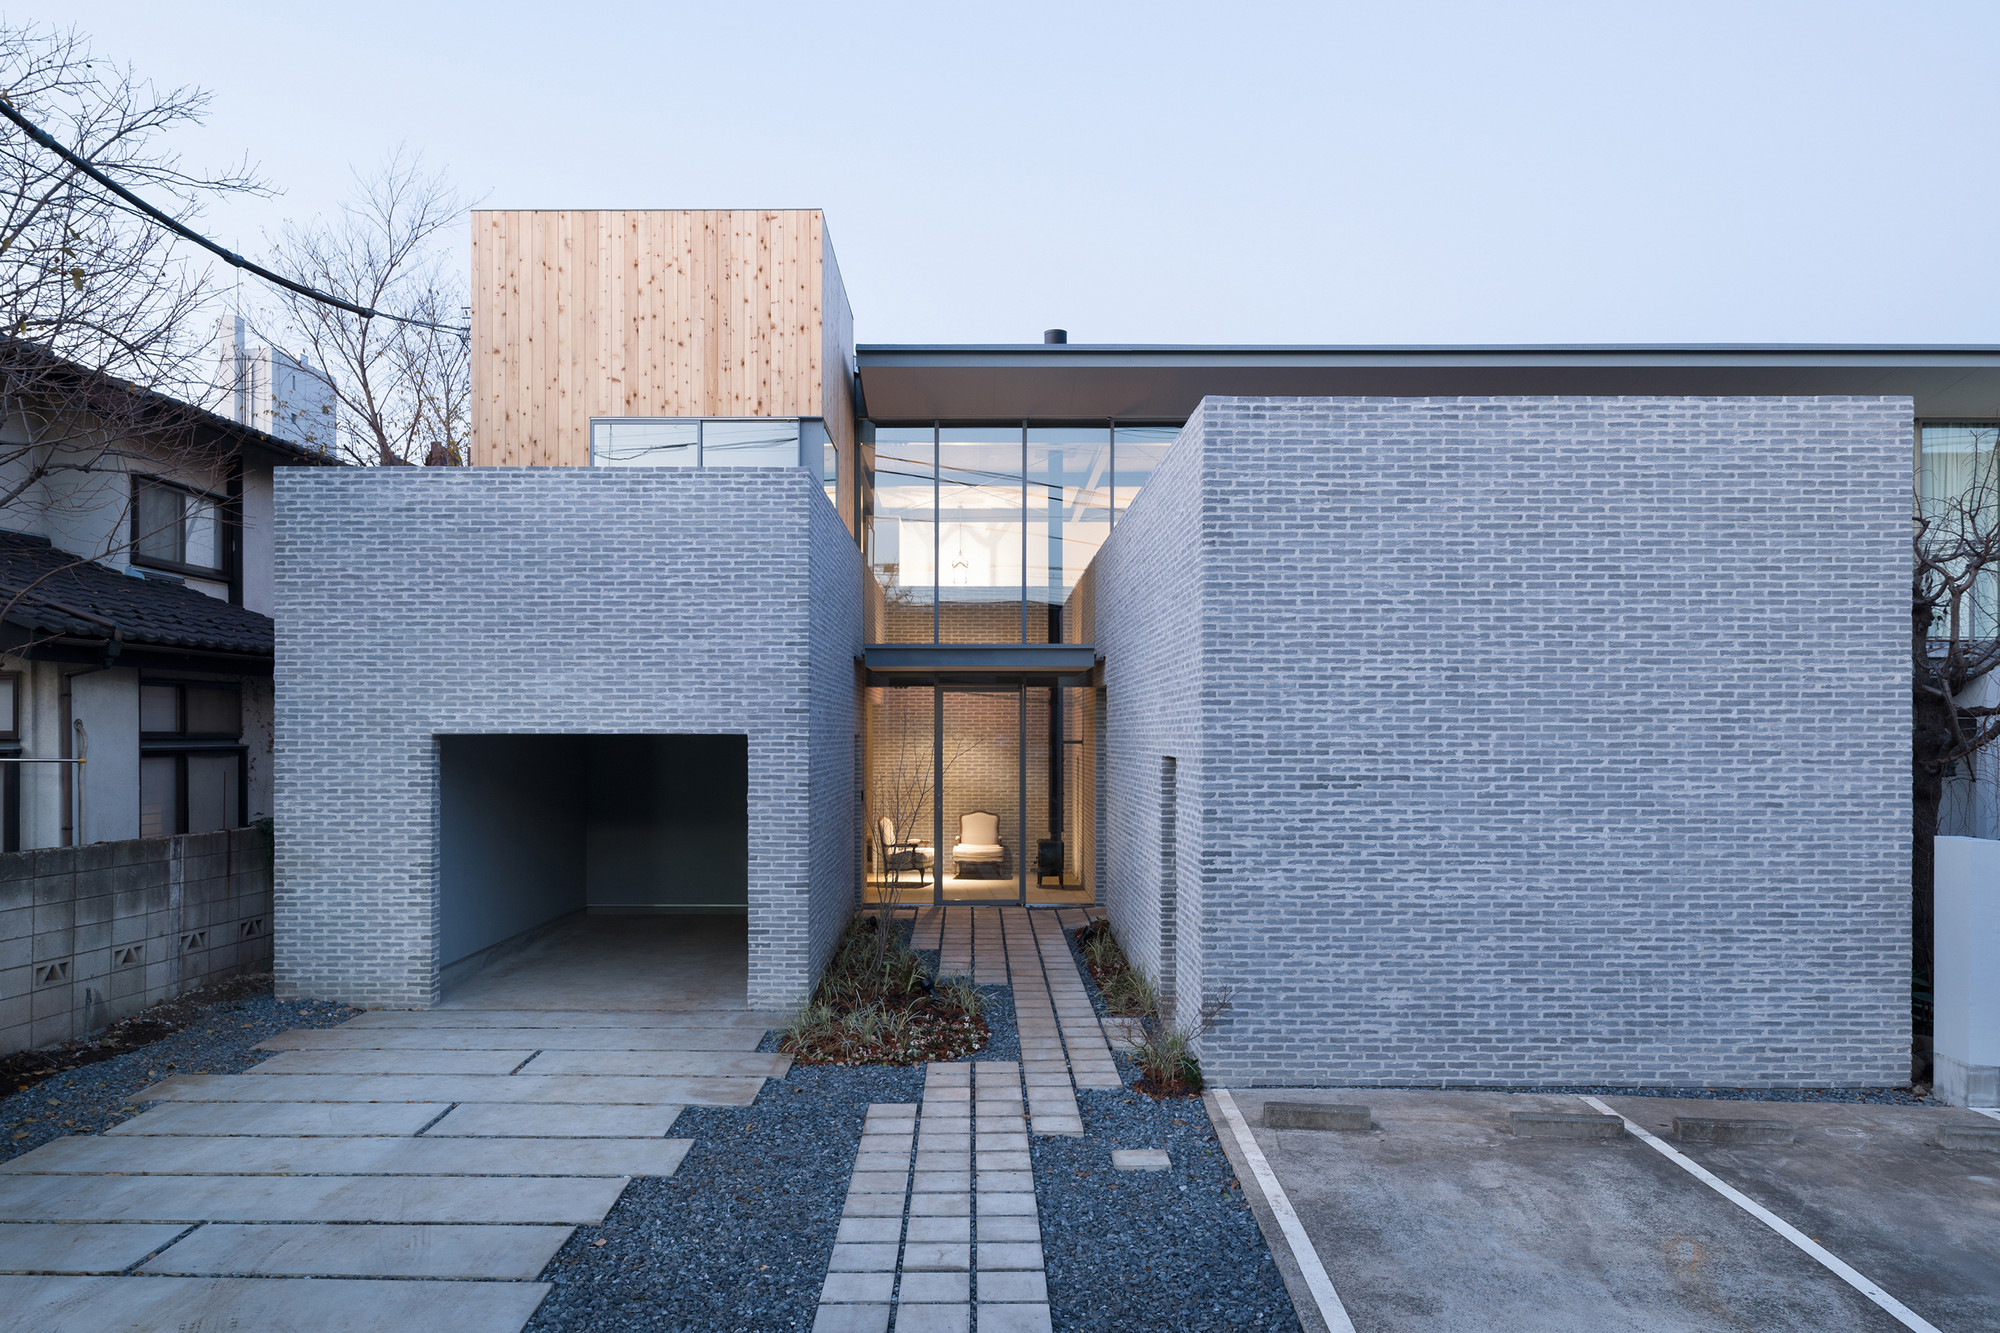 House in Sakurashinmachi / Comma Design, © Takumi Ota